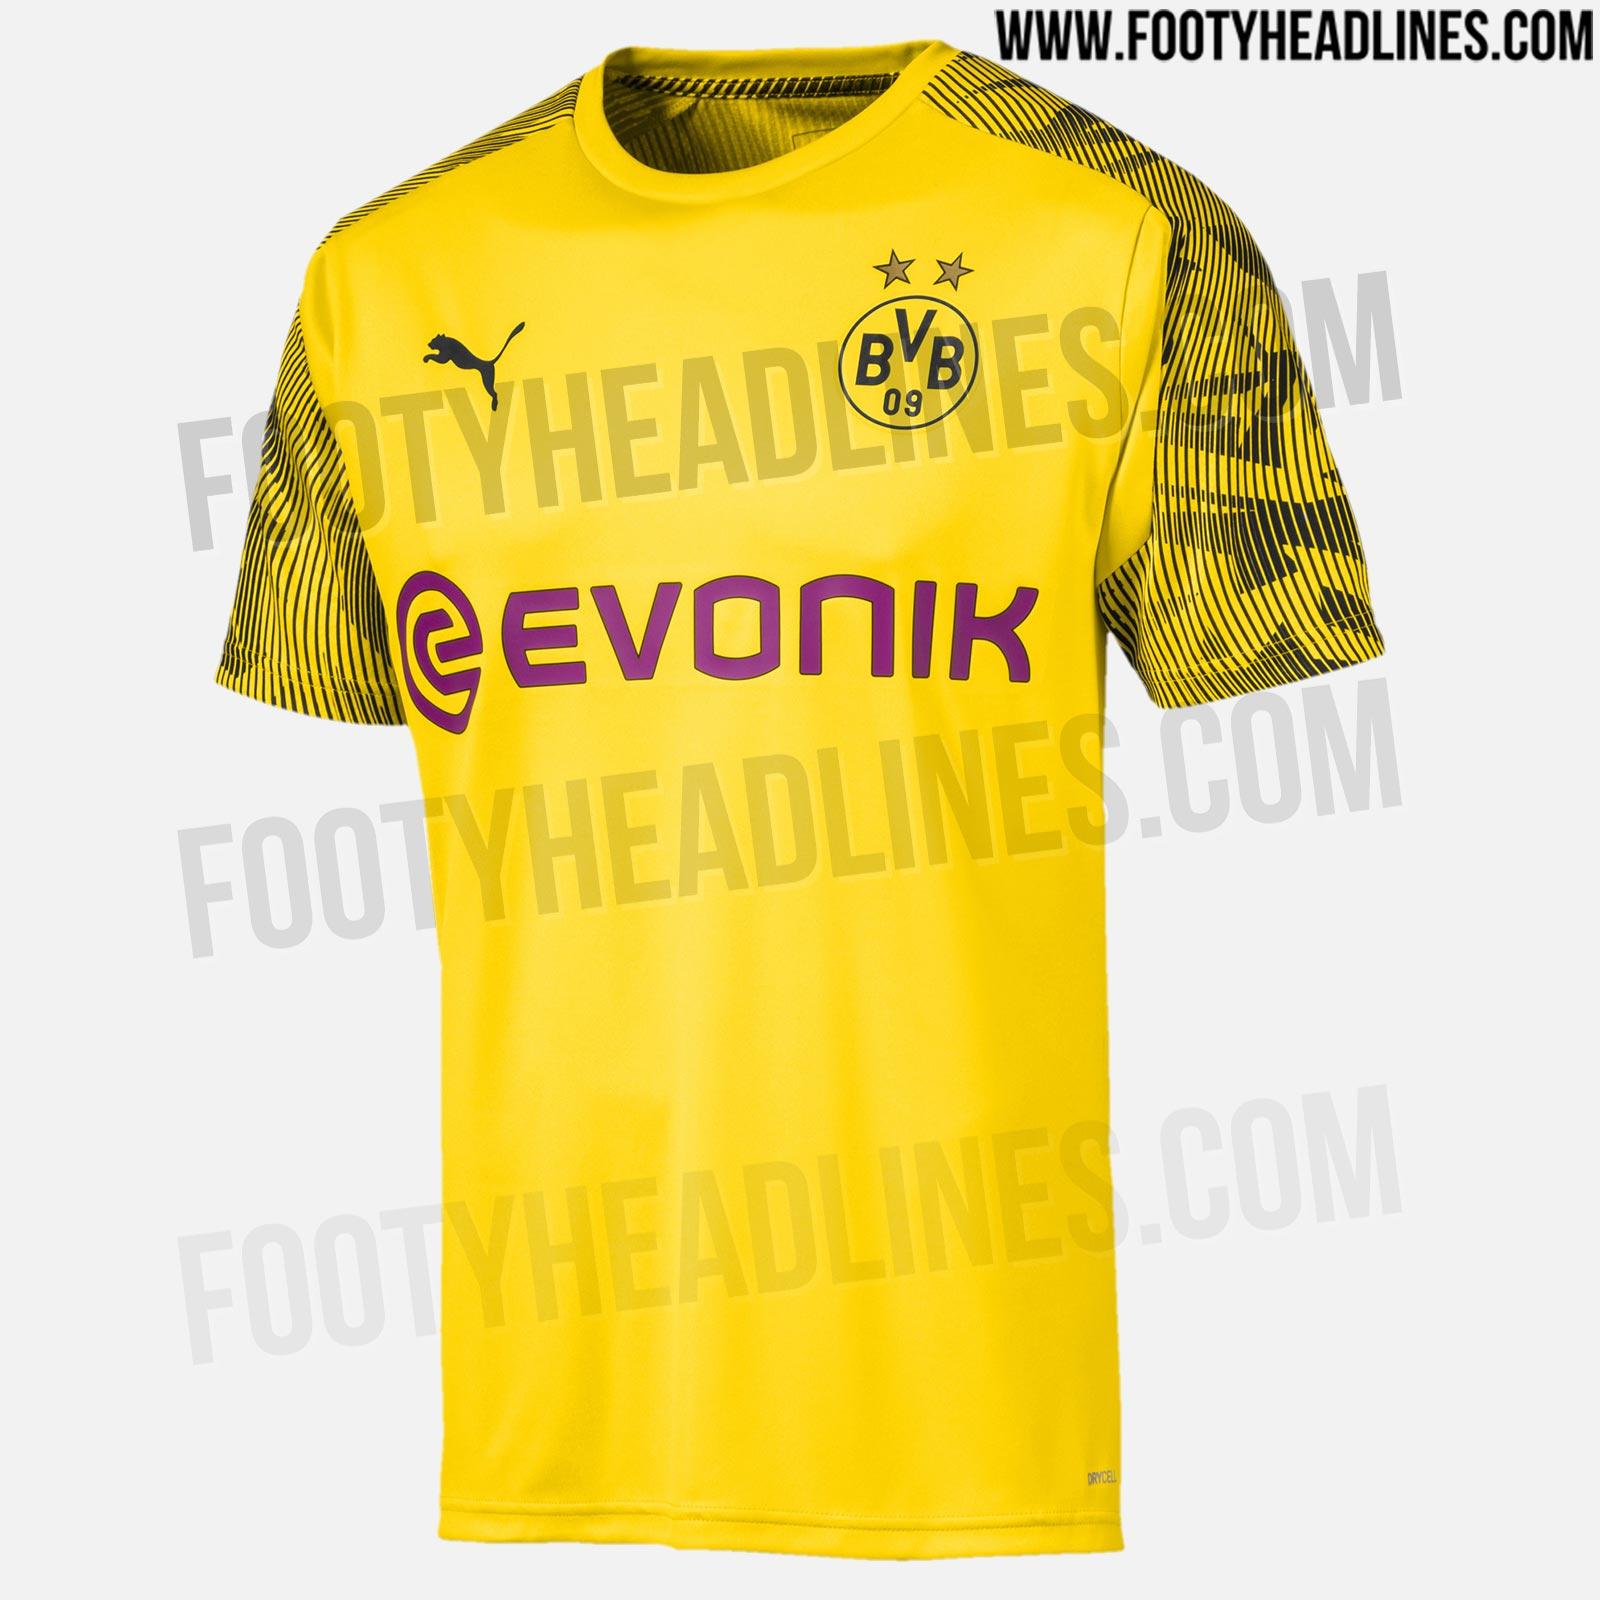 Borussia Dortmund 19 20 Training Kits Leaked Footy Headlines